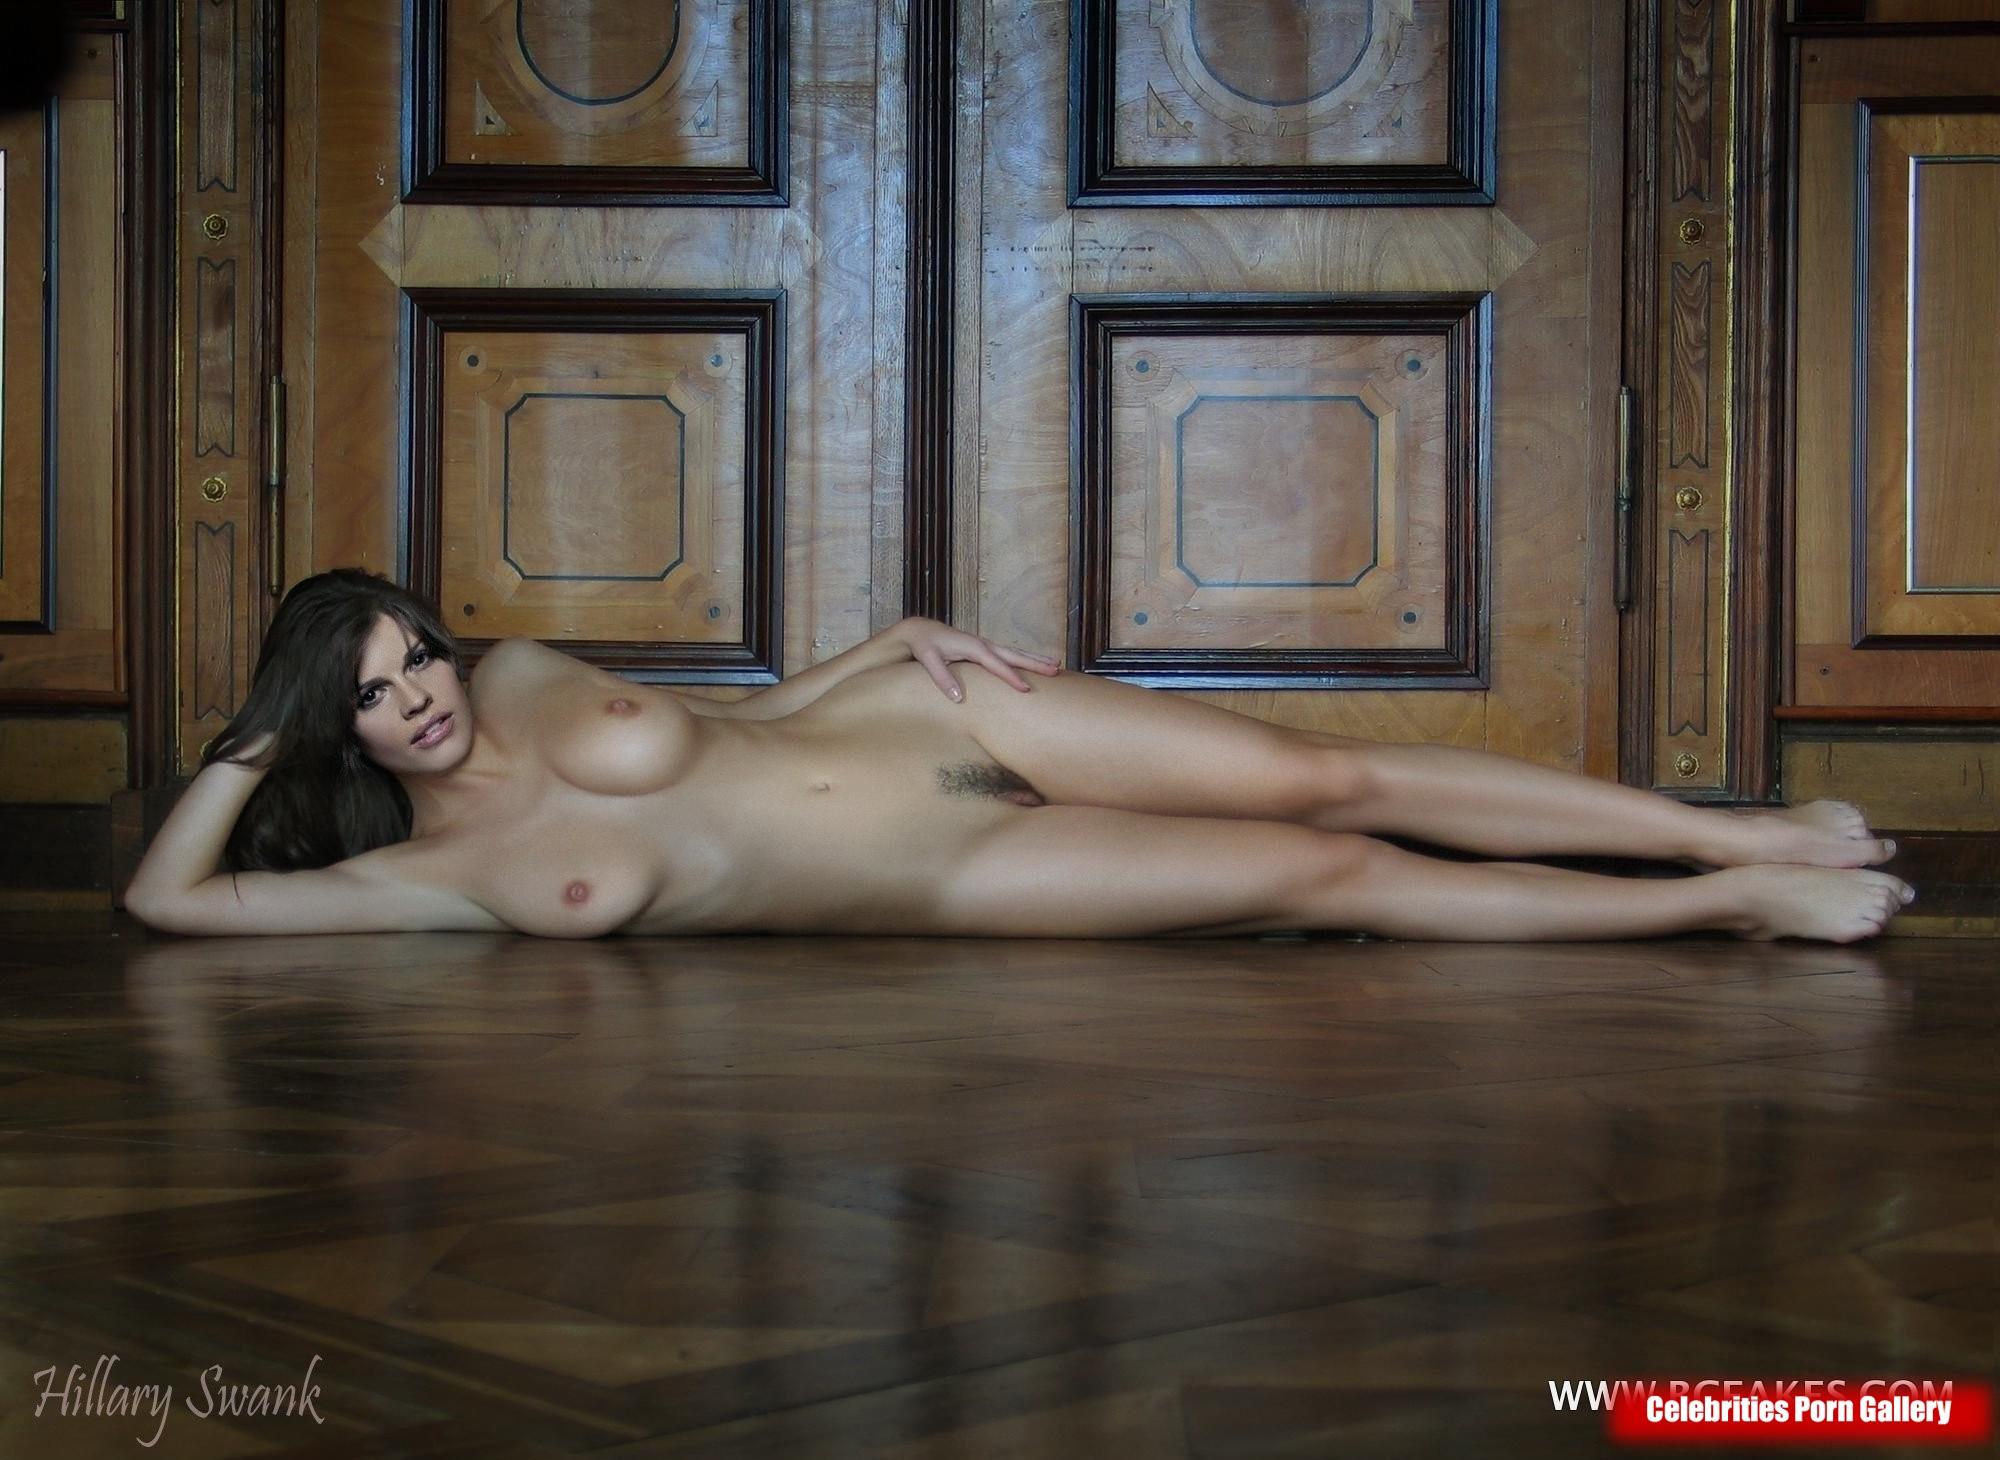 Topless hilary swank Sexy Hilary